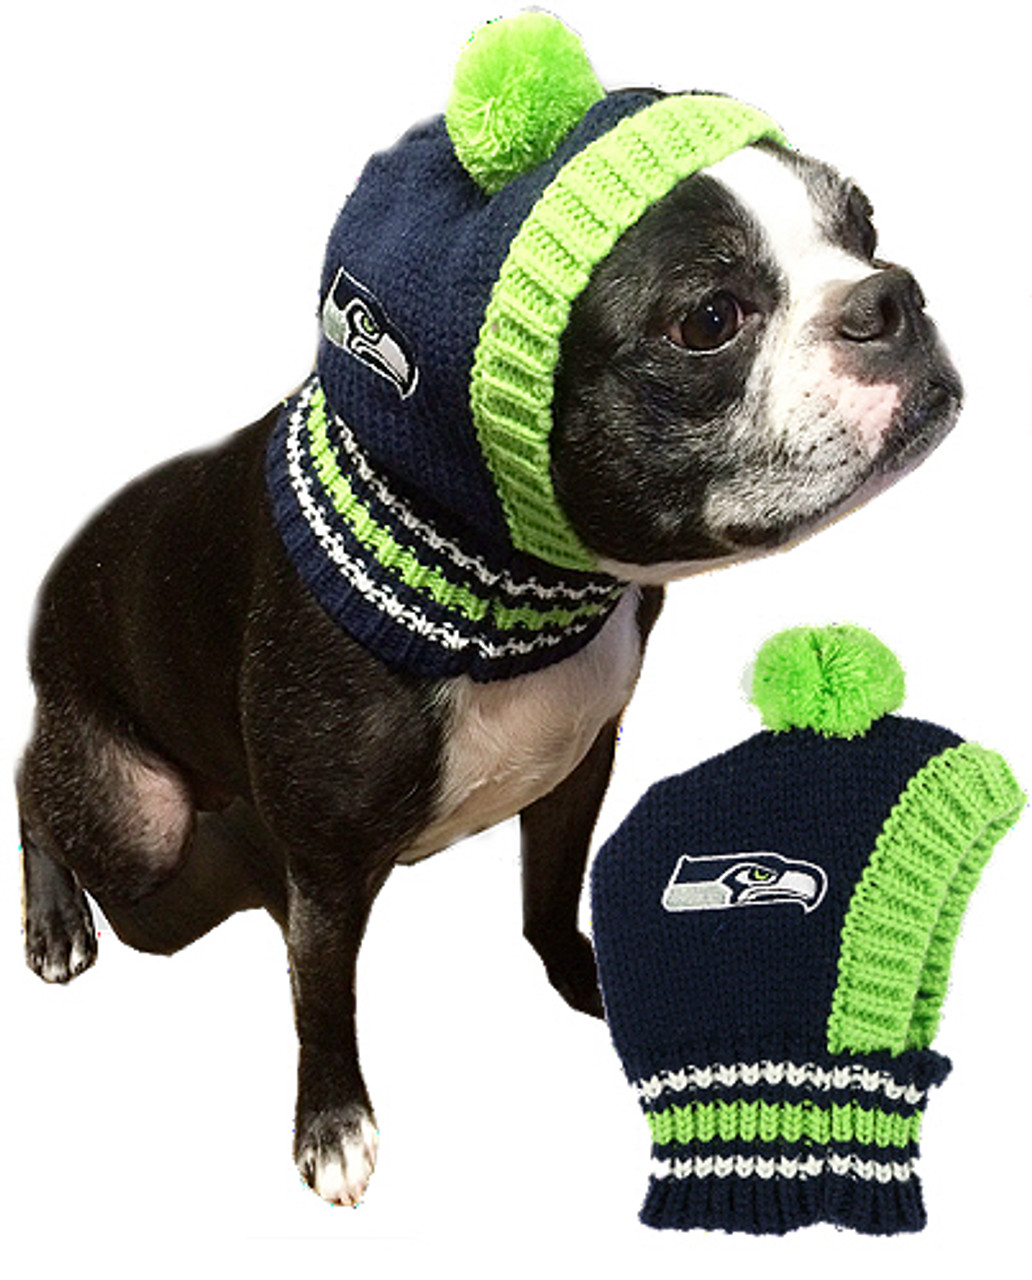 716bdaa4e99 NFL Seattle Seahawks Knit Dog Ski Hat | Hip Doggie at PupRwear | GW Little